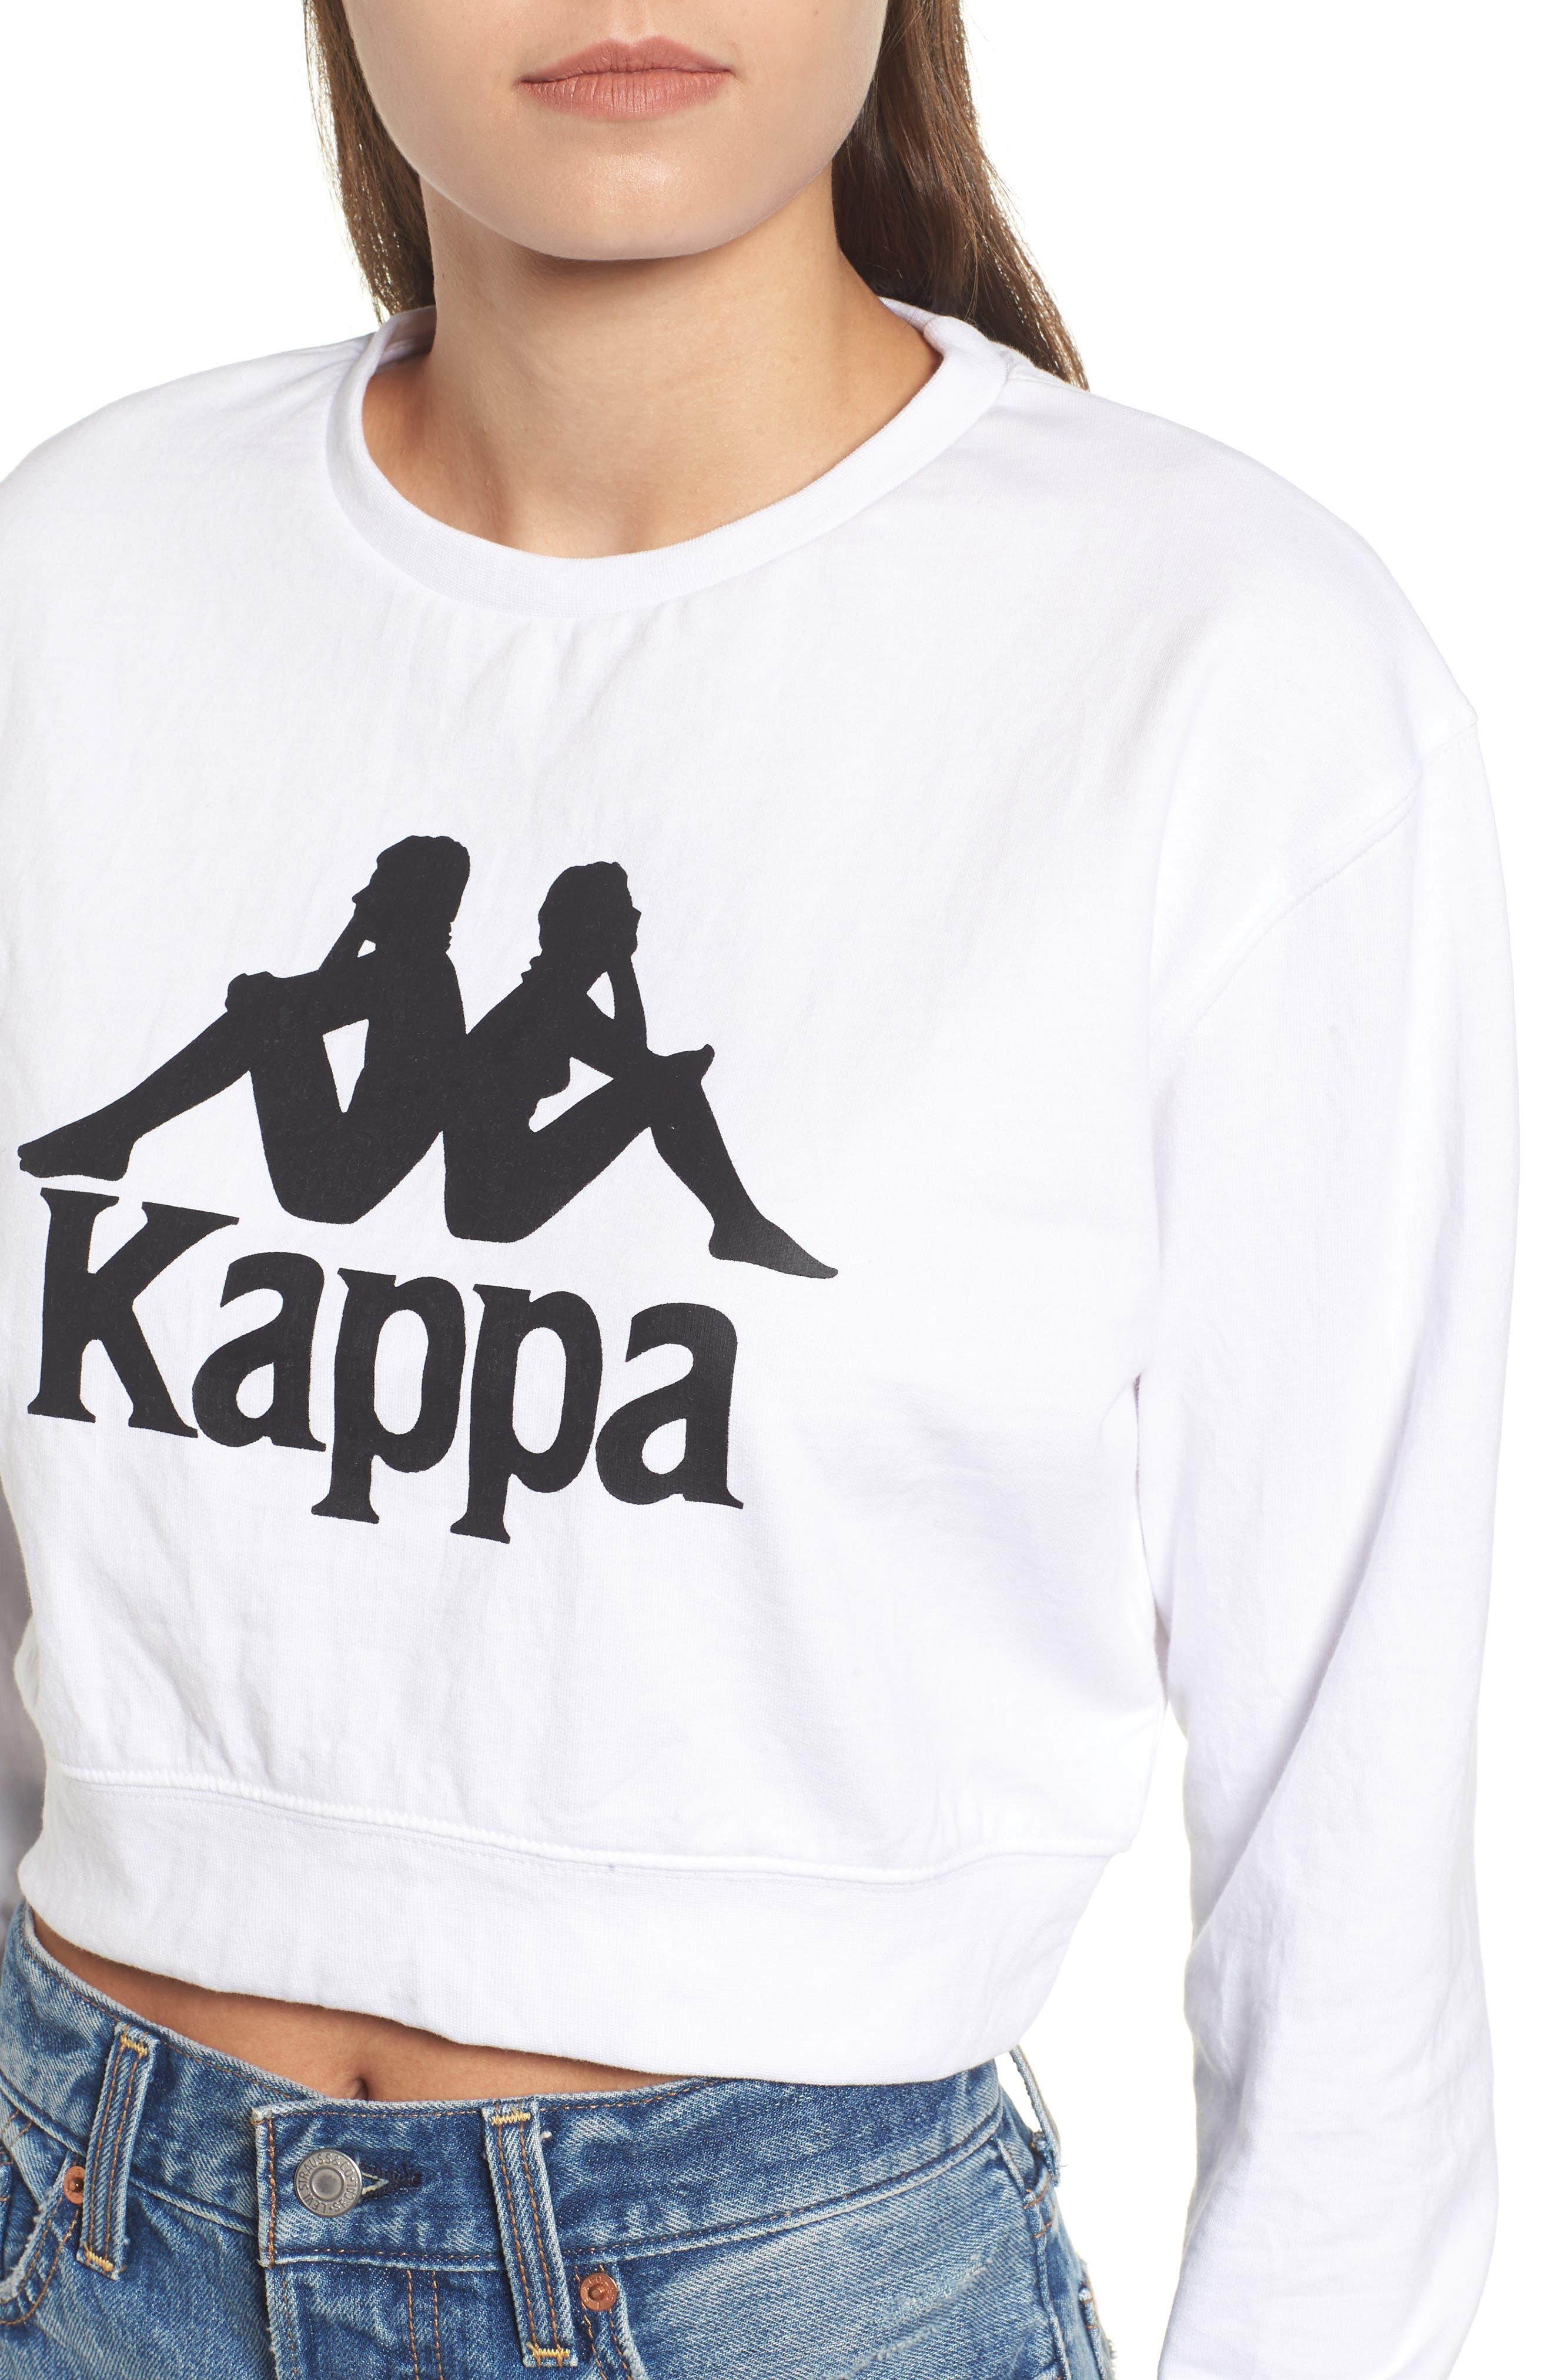 Bamm Bamm Crop Sweatshirt,                             Alternate thumbnail 4, color,                             White